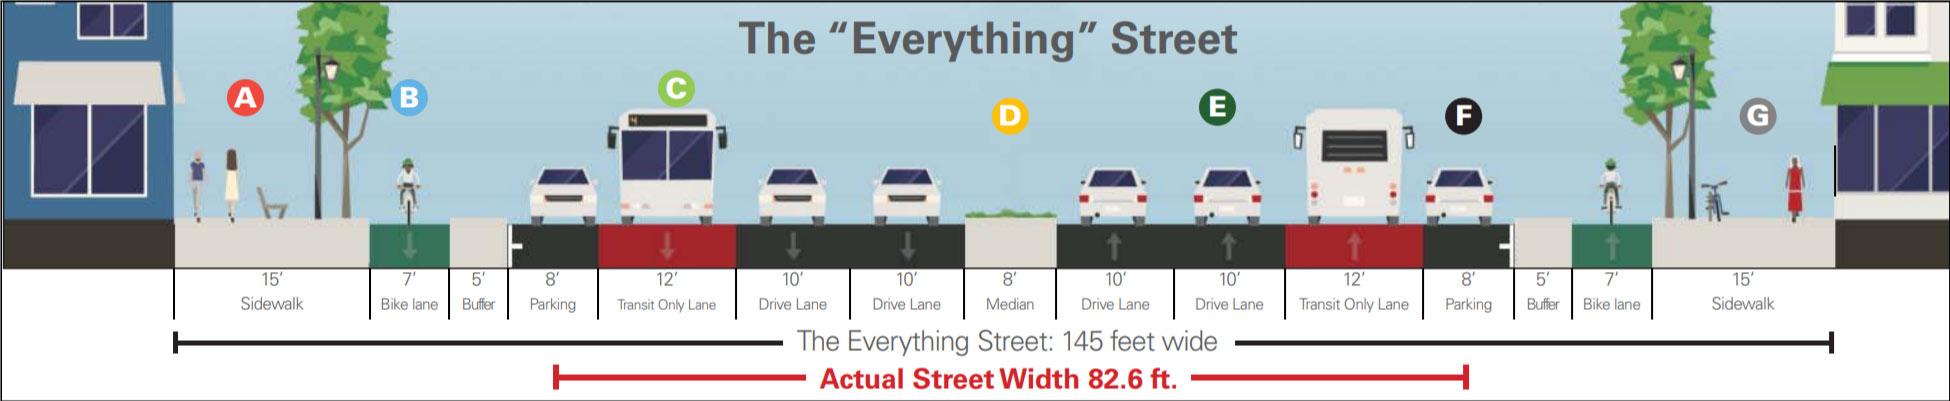 Folsom Street Plan